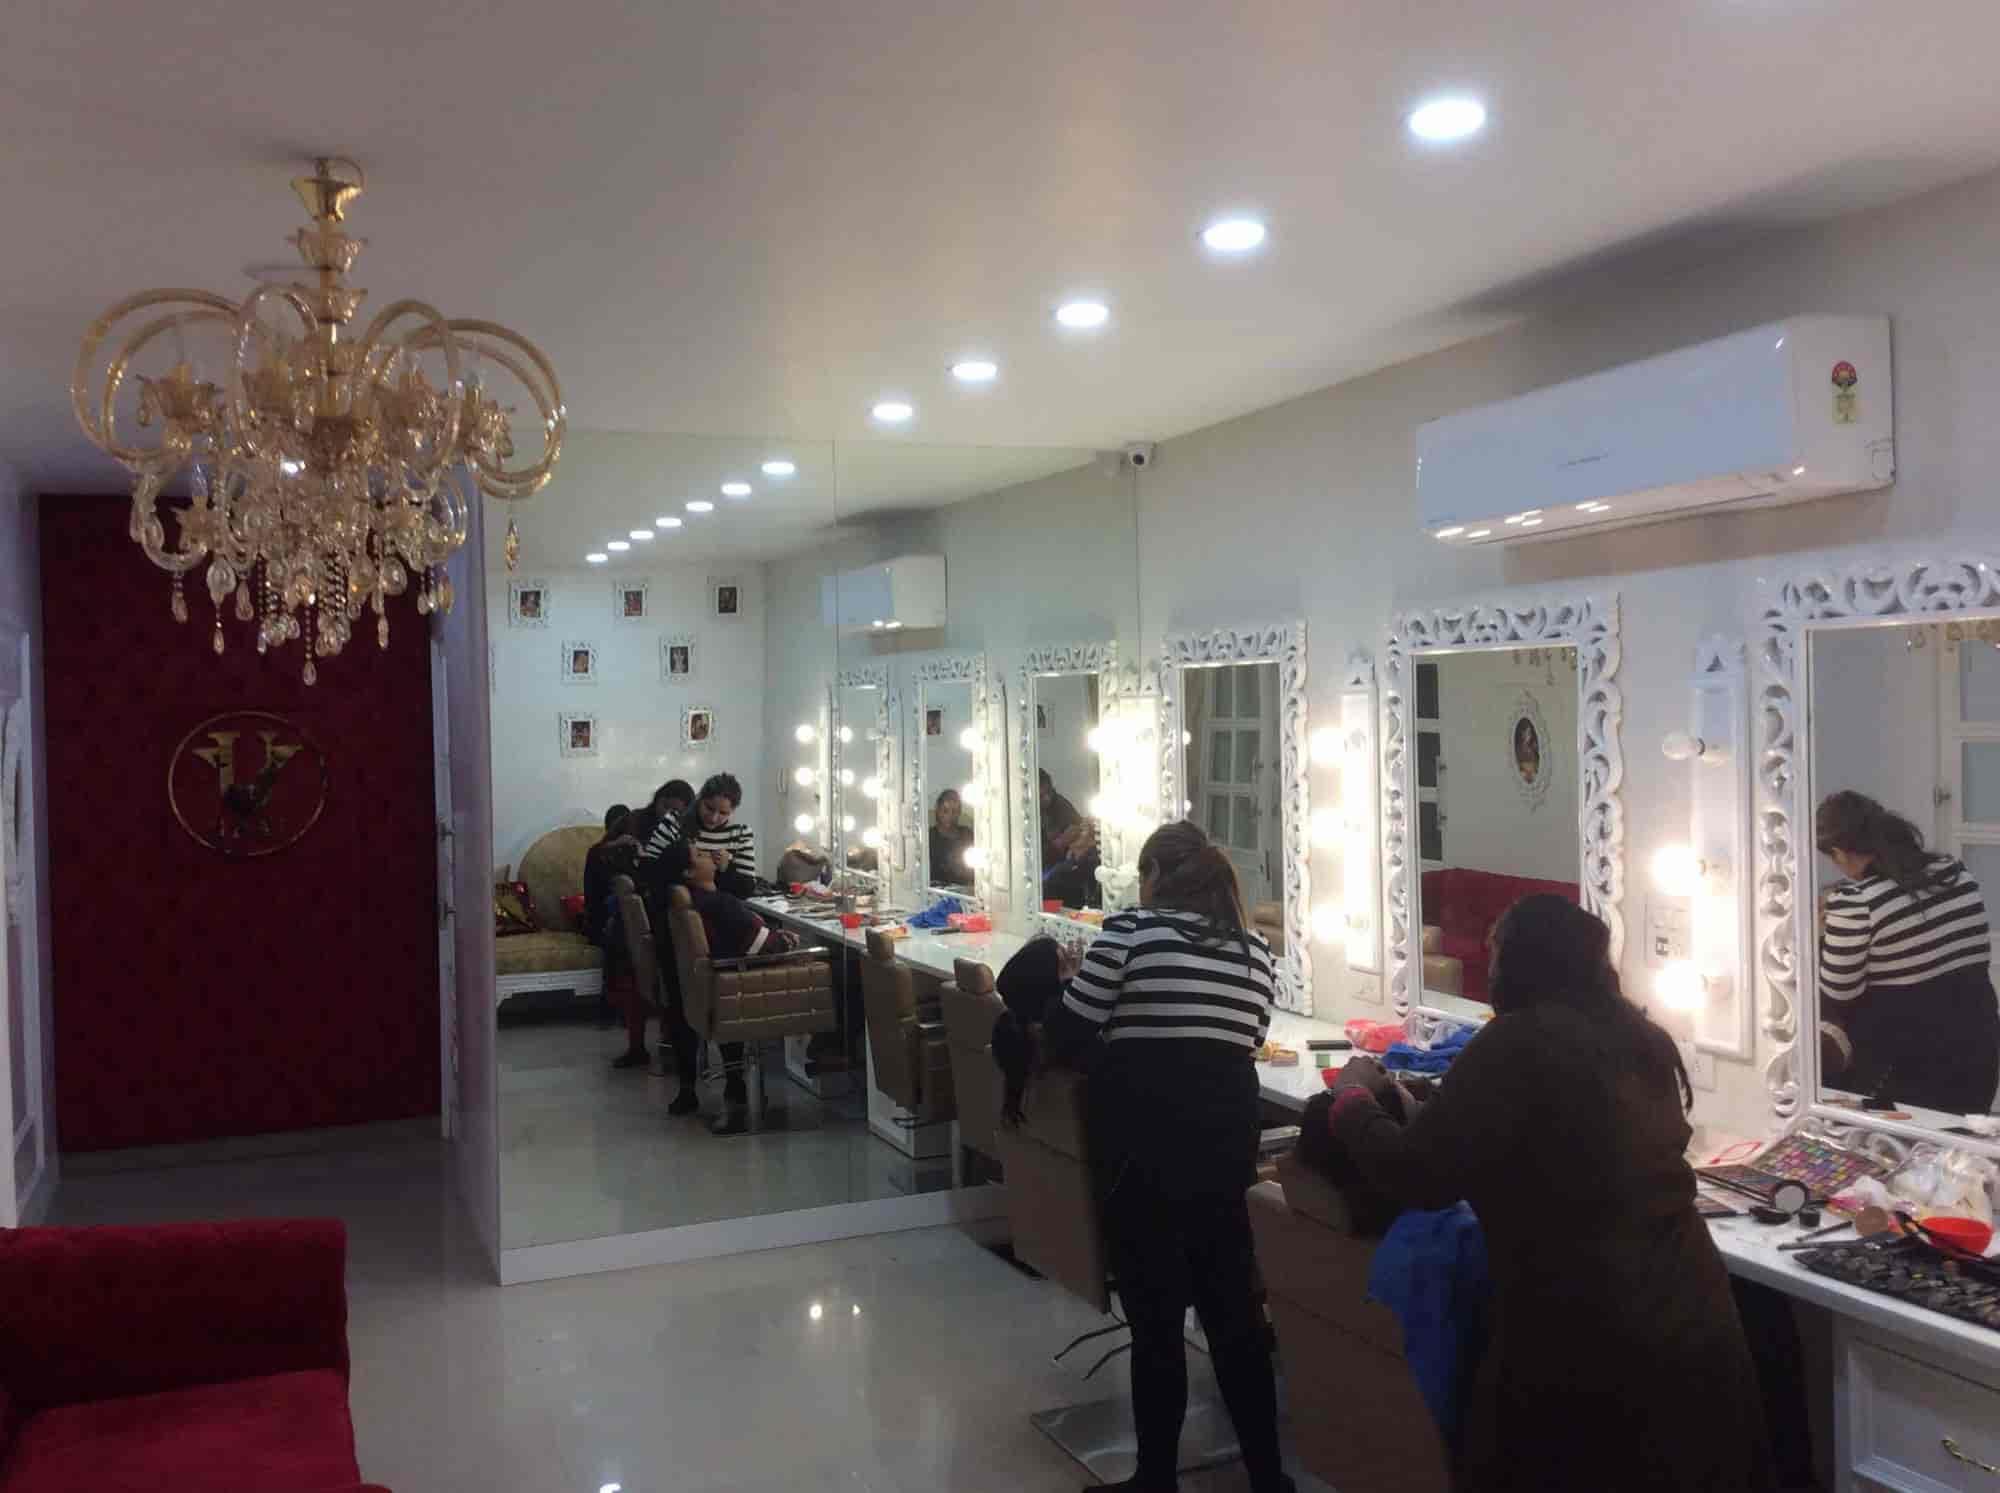 uv ghai bridal makeup studio academy photos aarti chowk ludhiana